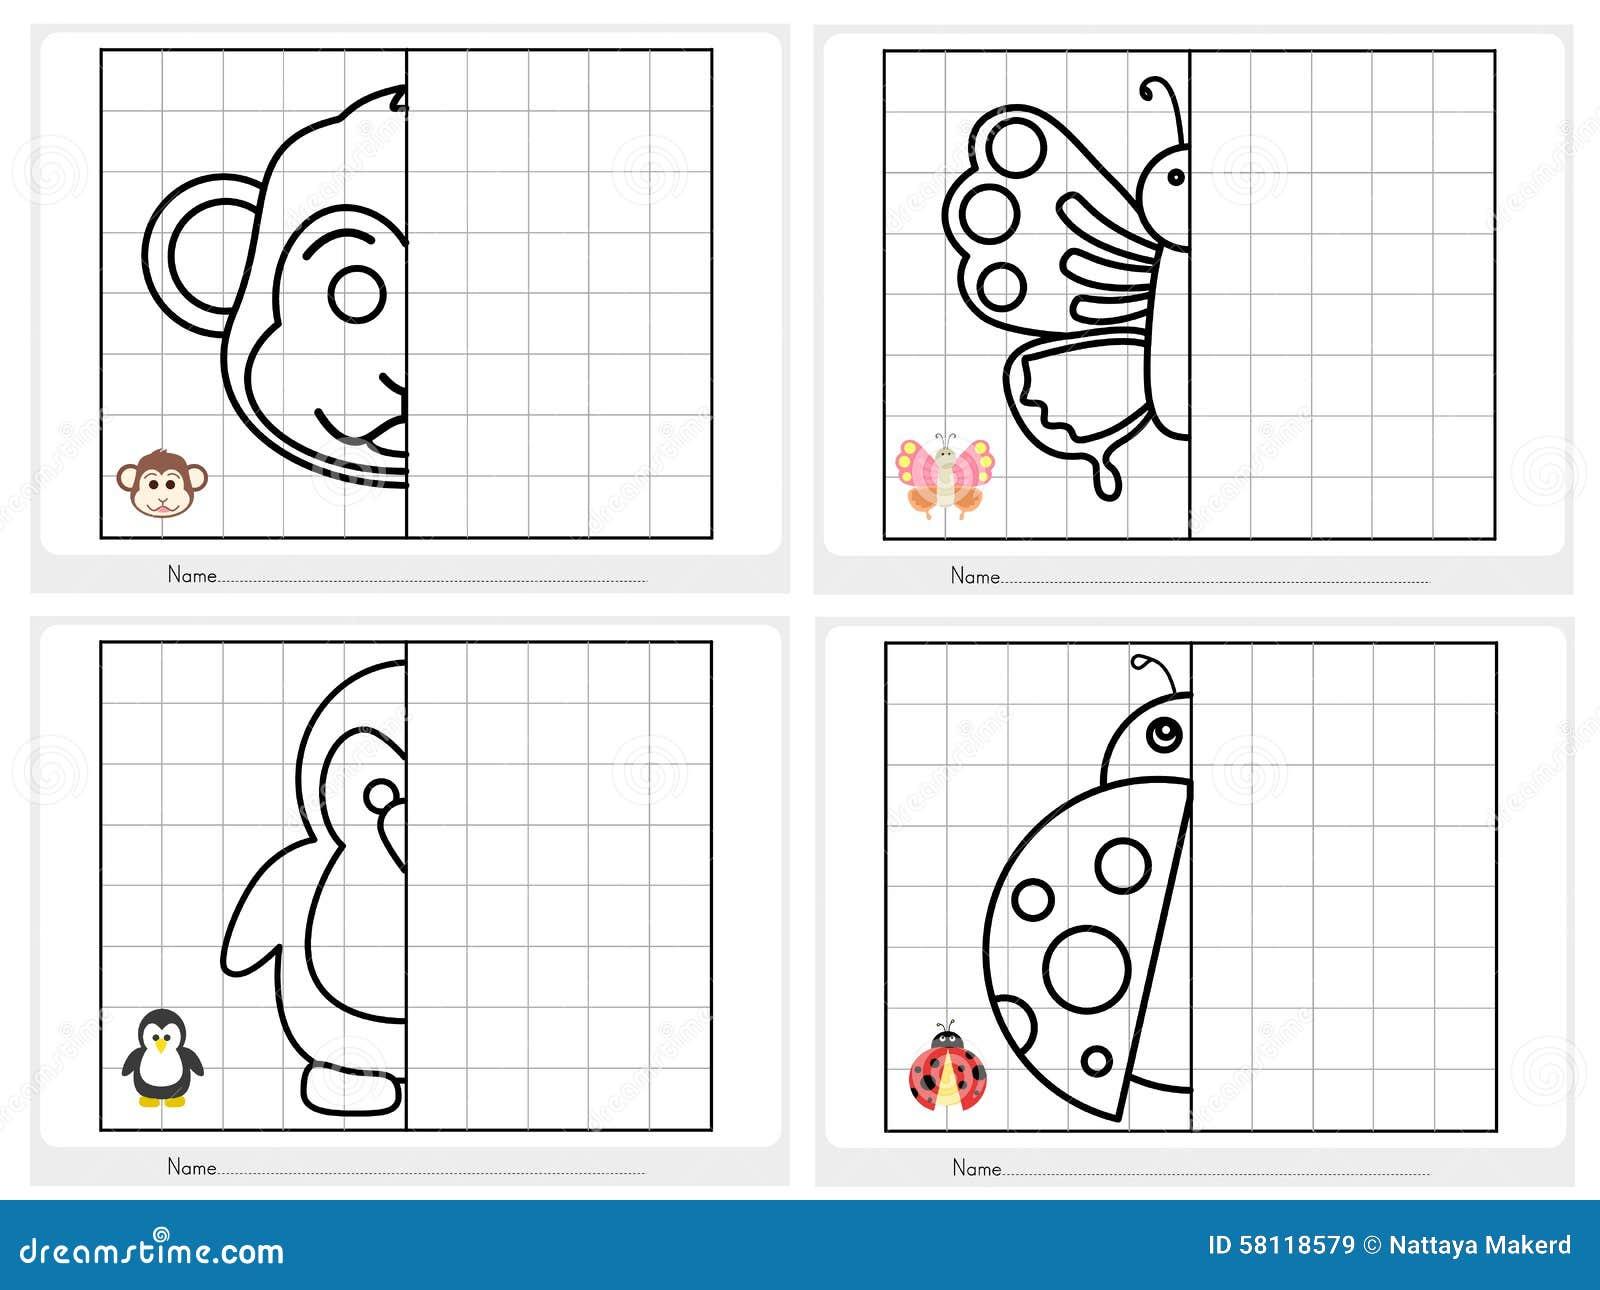 HD wallpapers animals kindergarten worksheets wallieepattern.cf